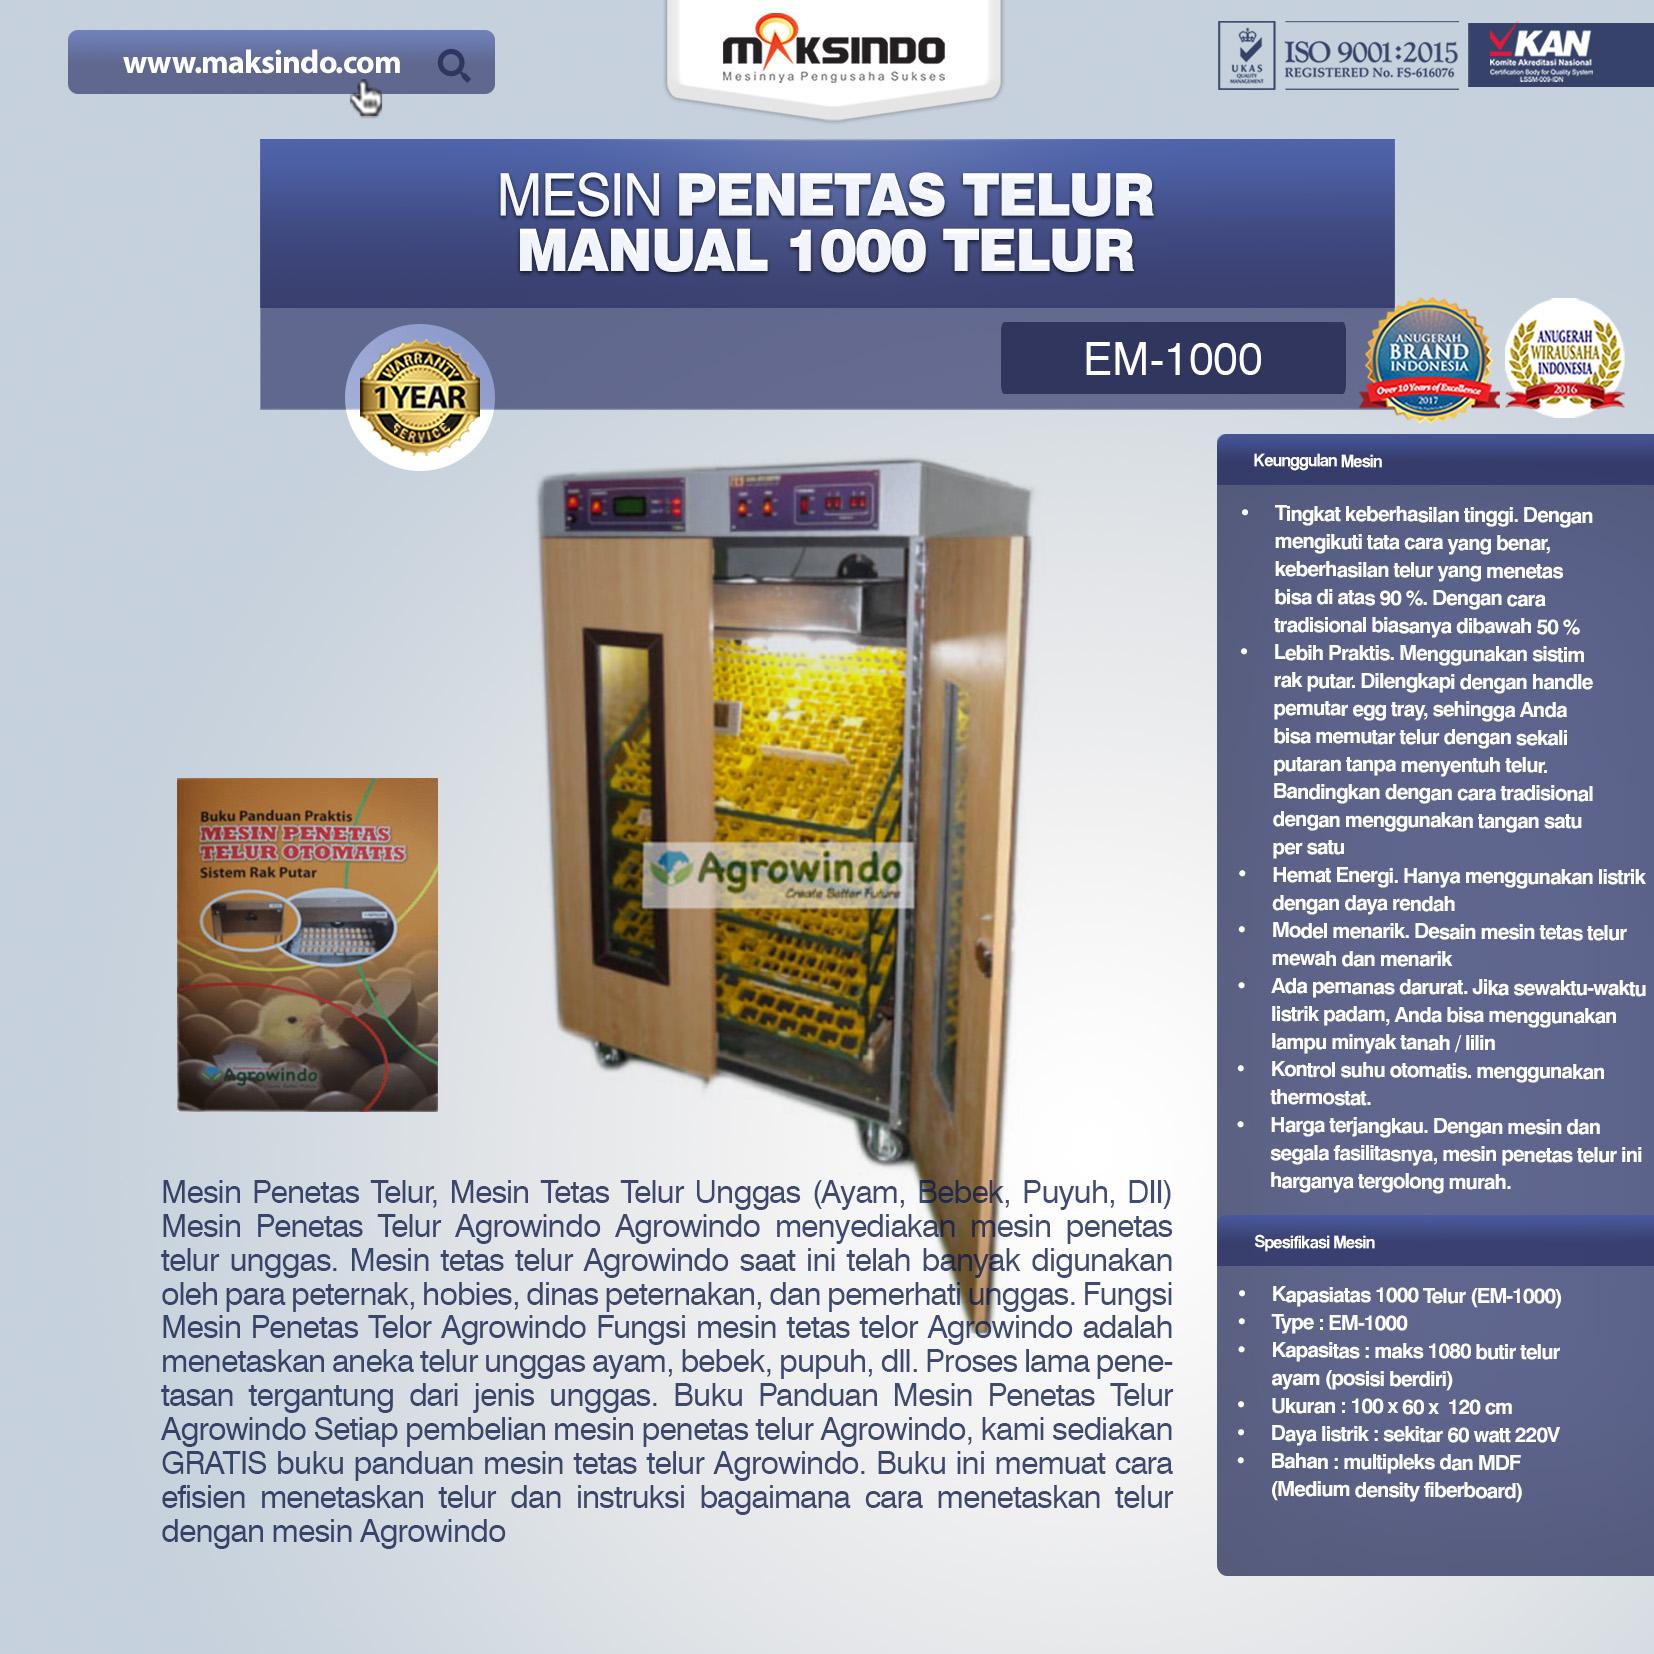 Mesin Penetas Telur Manual 1000 Telur (EM-1000)